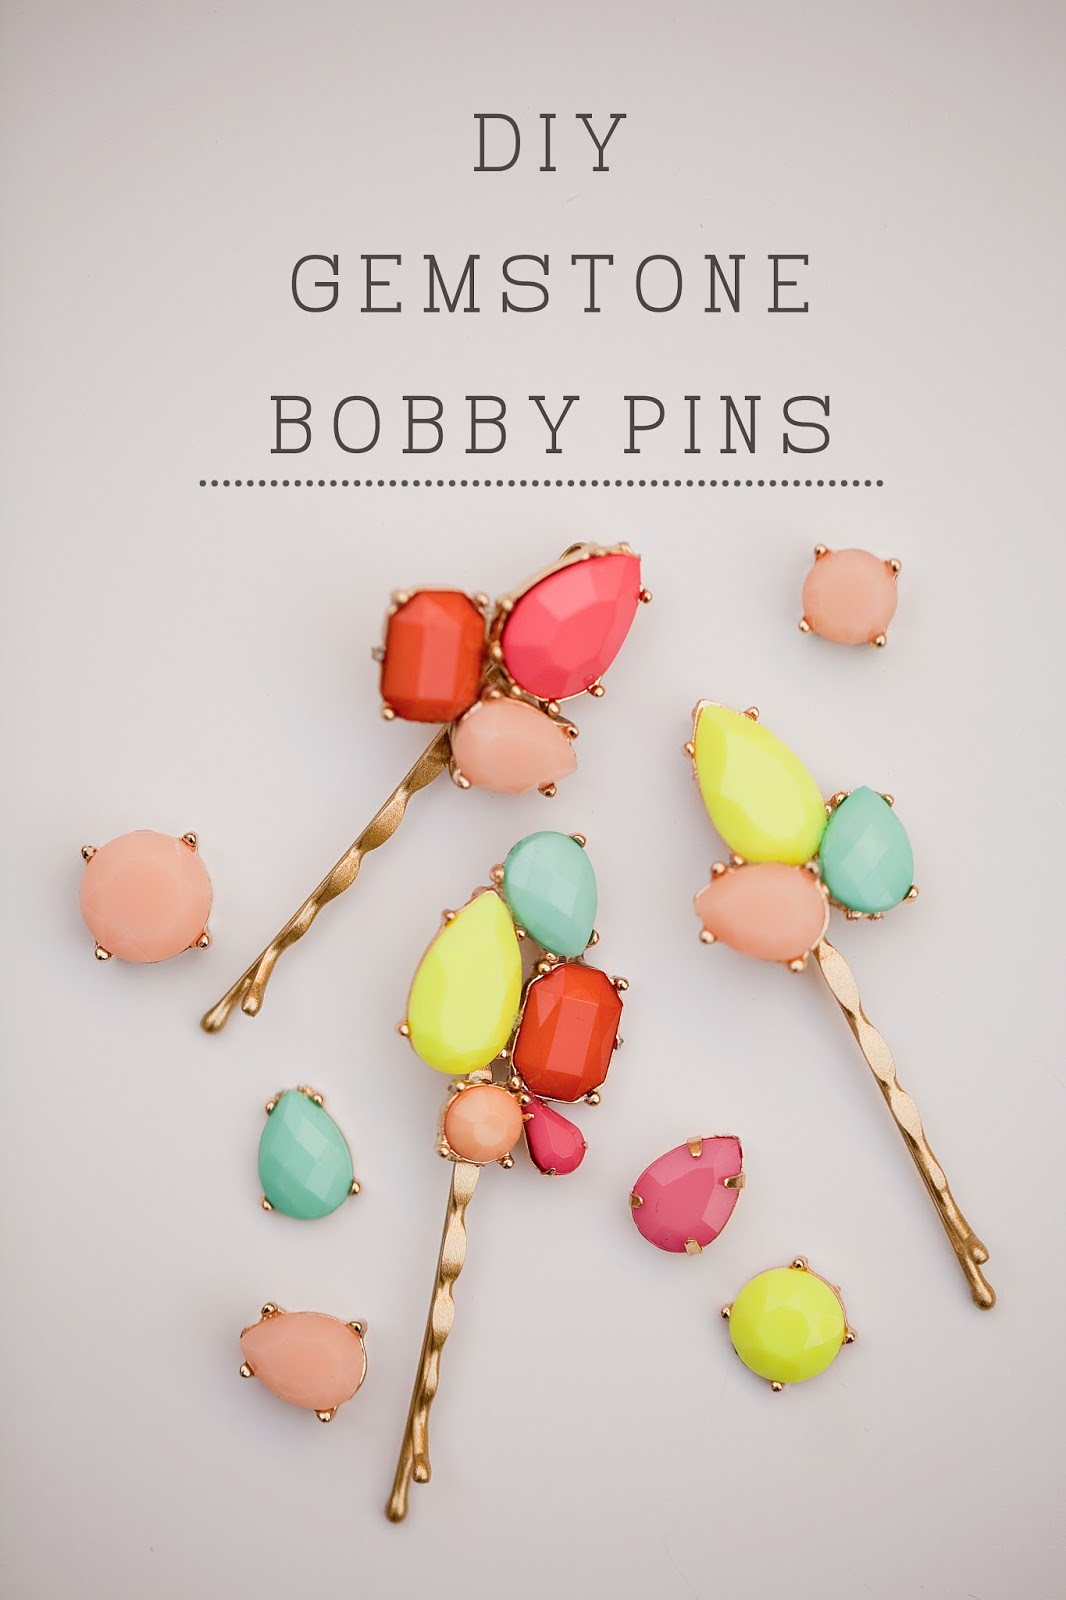 Tell Diy Gemstone Bobby Pins